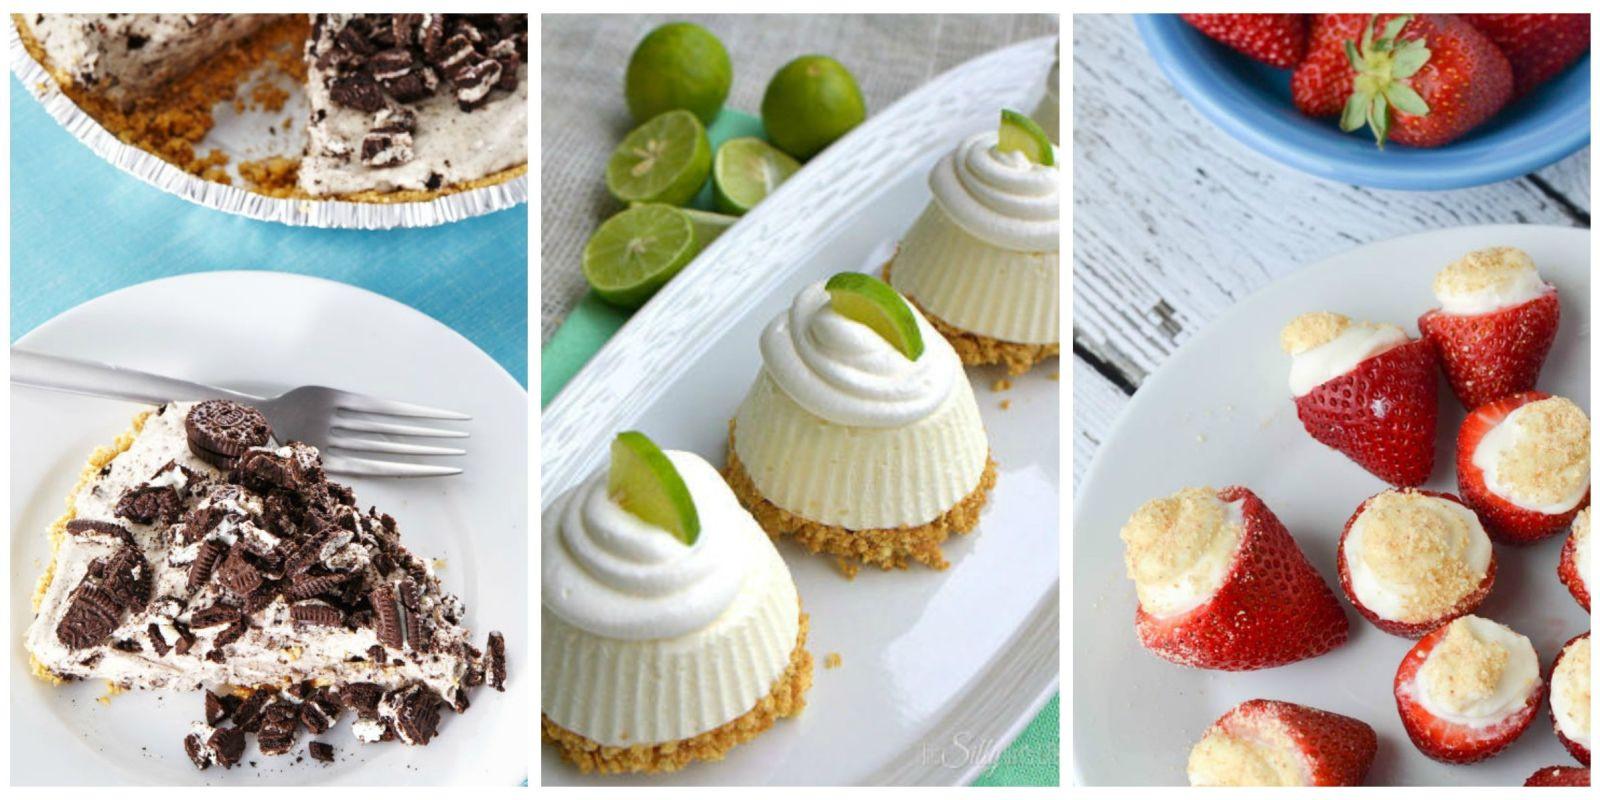 Great Summer Desserts  57 Easy Summer Desserts Best Recipes for Frozen Summer